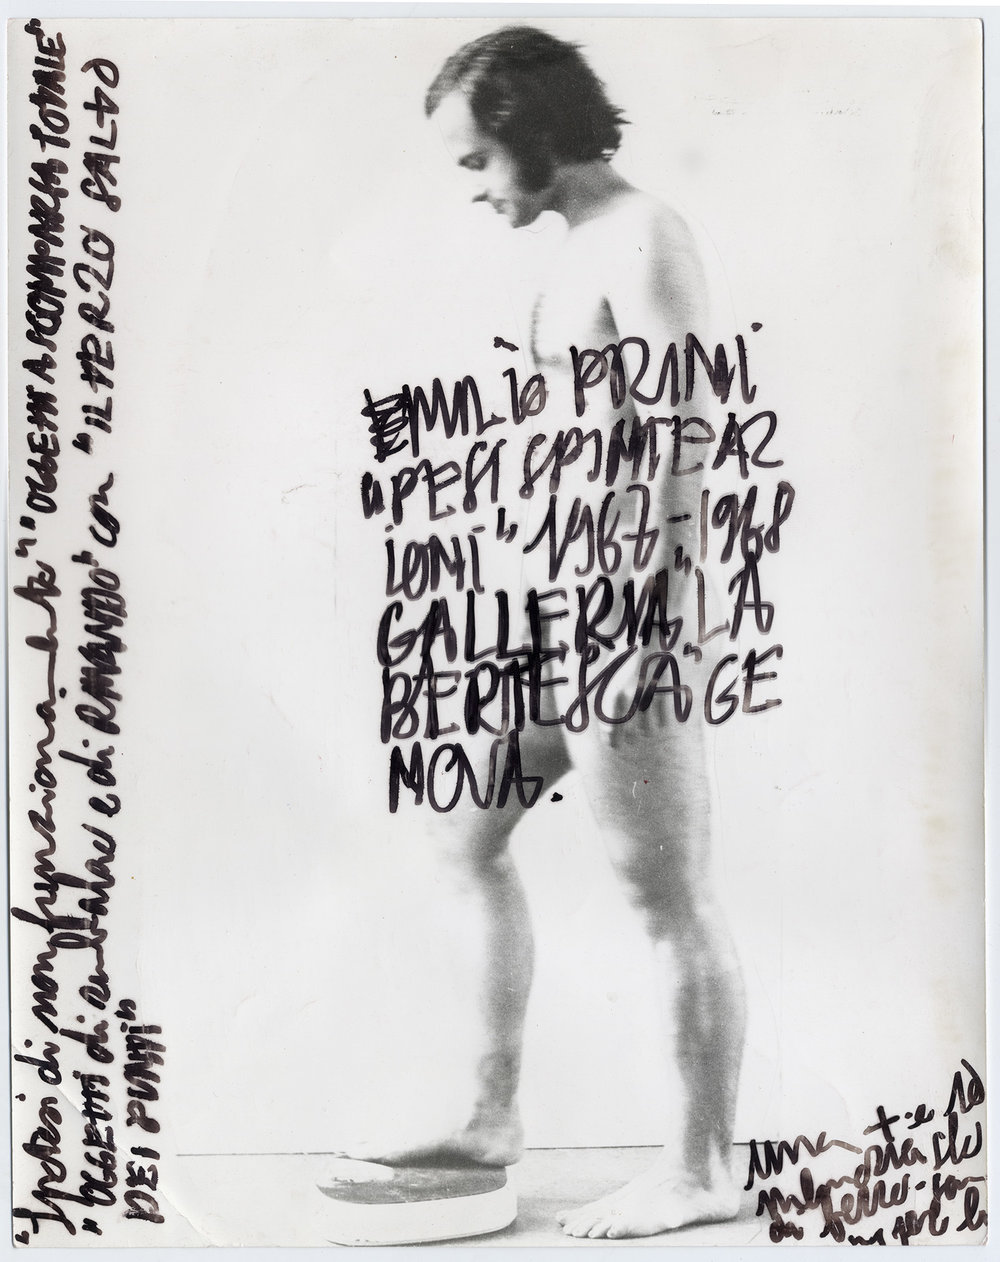 Emilio Prini a pesi Galleria la Bertesca | 1967/68 | Fotografie, Filzmarker | 30 x 23,5cm